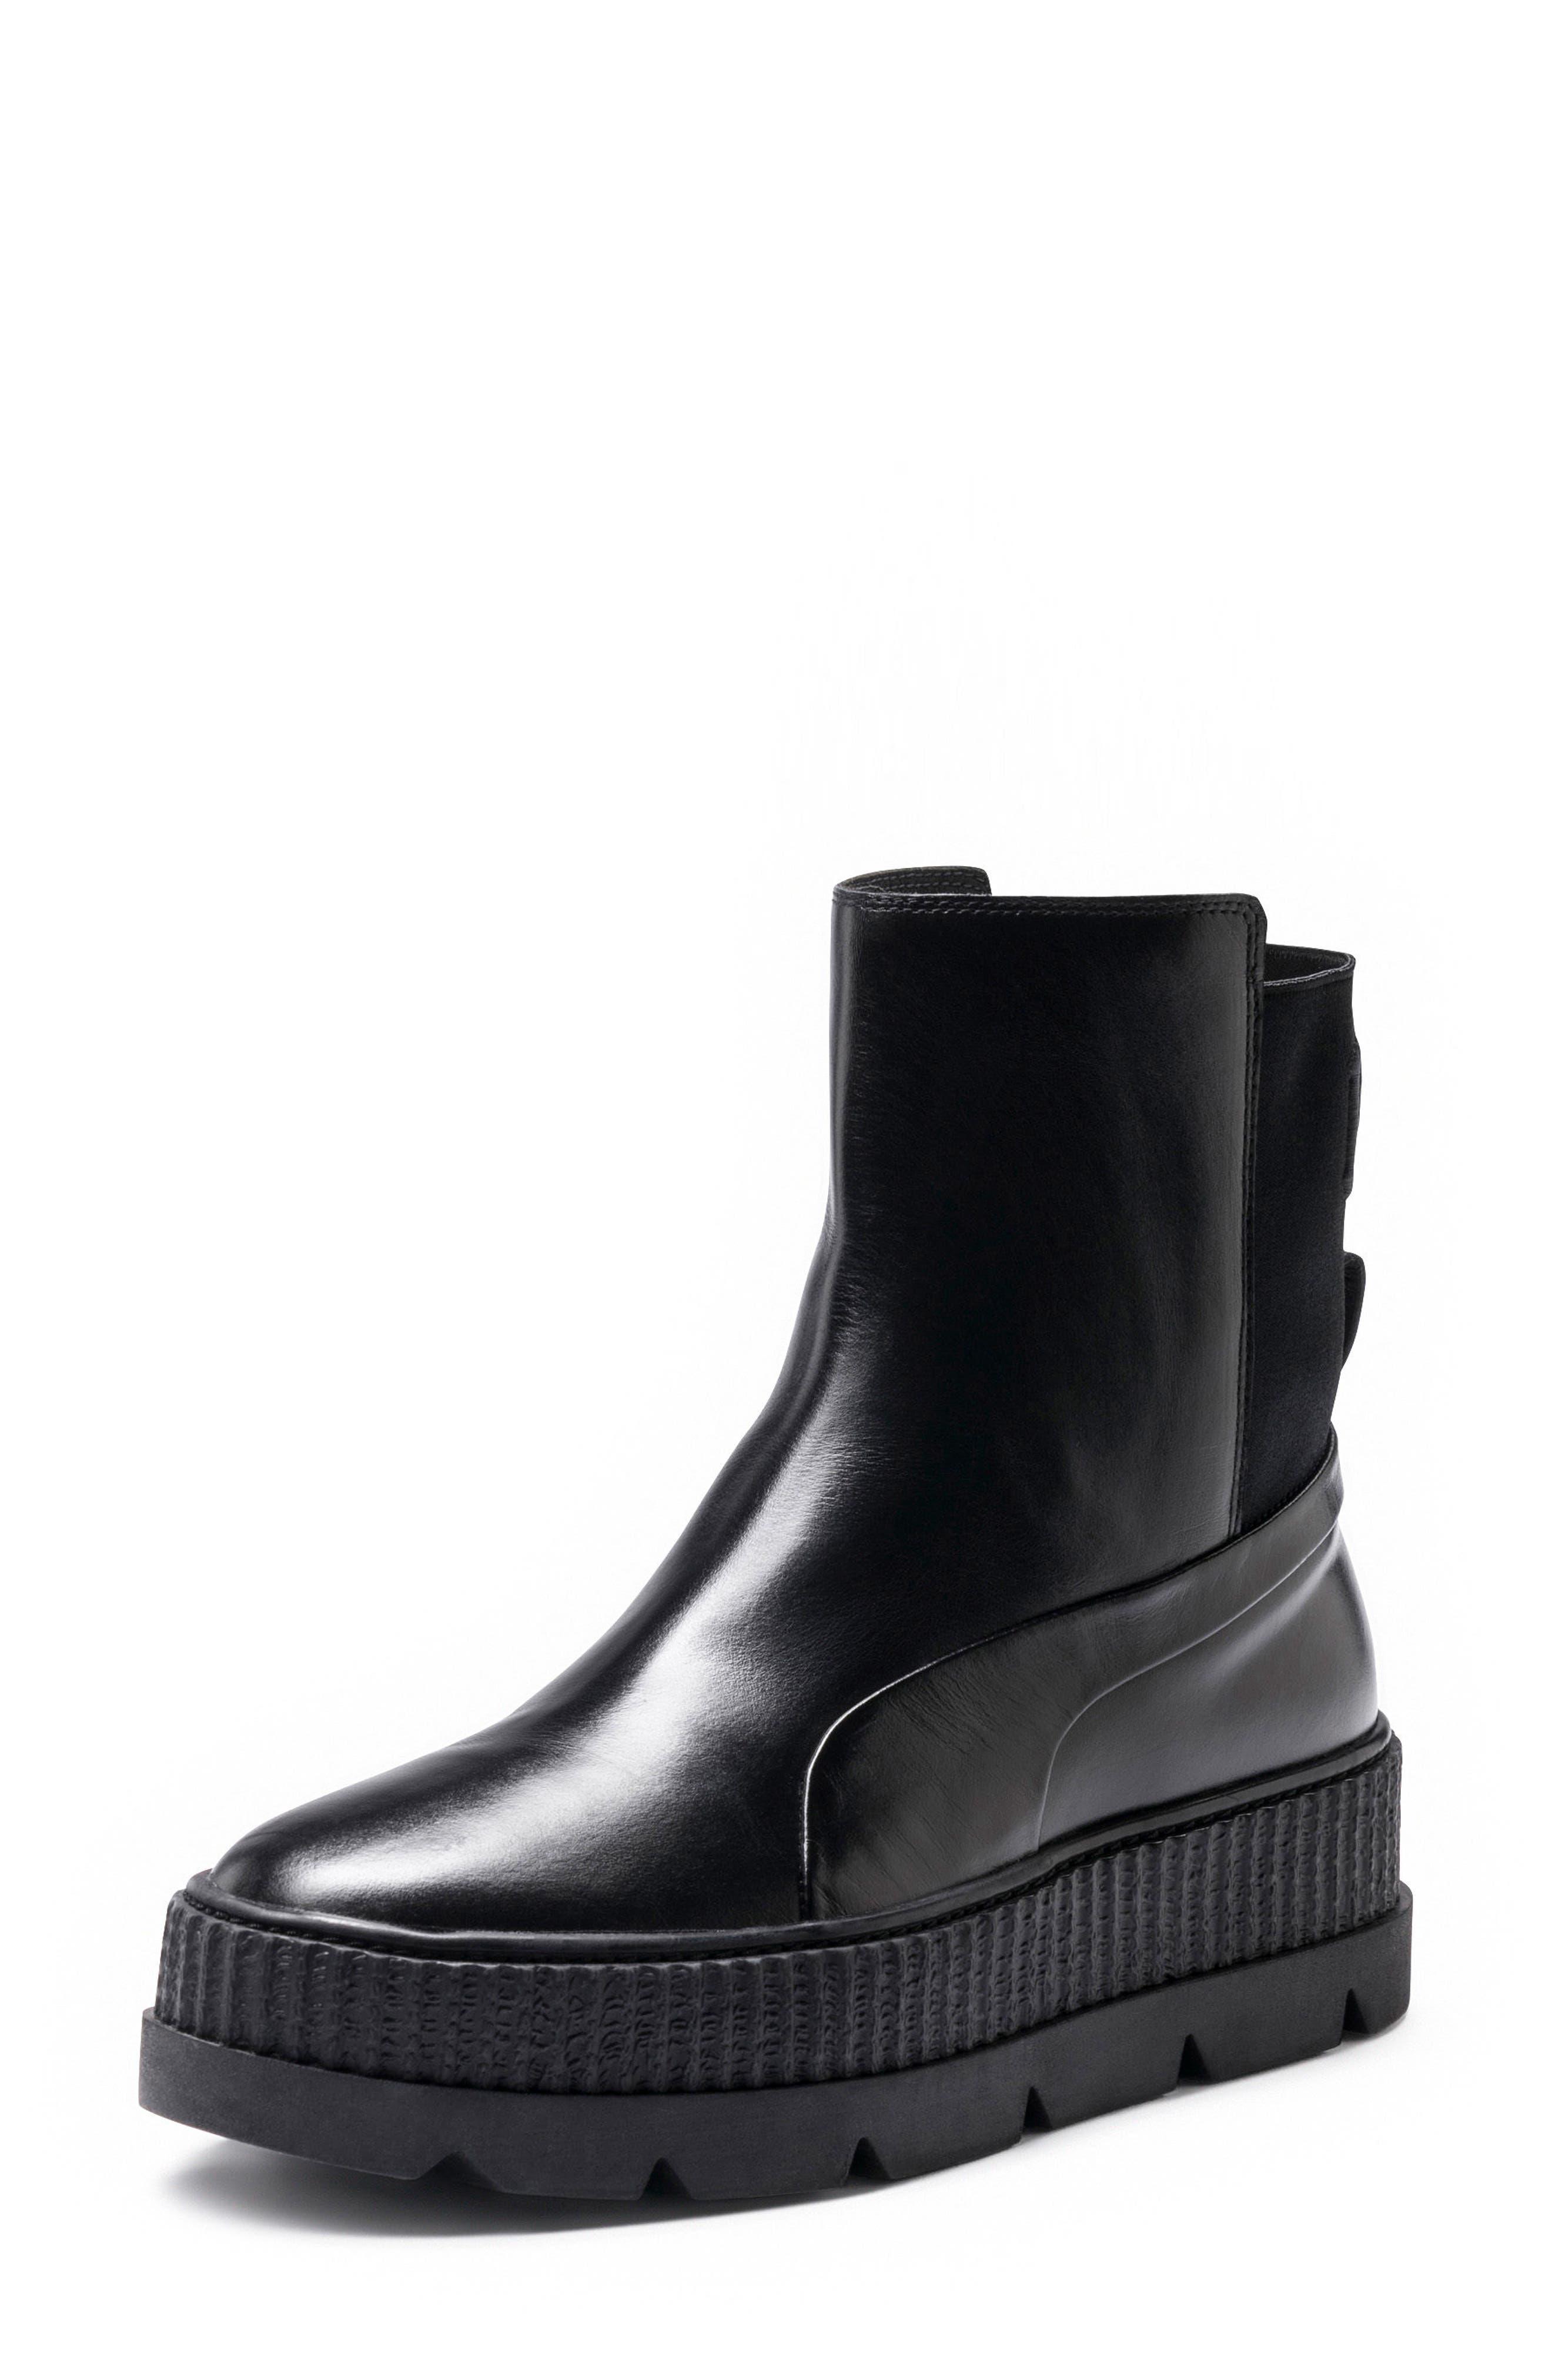 FENTY PUMA by Rihanna Chelsea Boot Creeper Sneaker,                         Main,                         color,